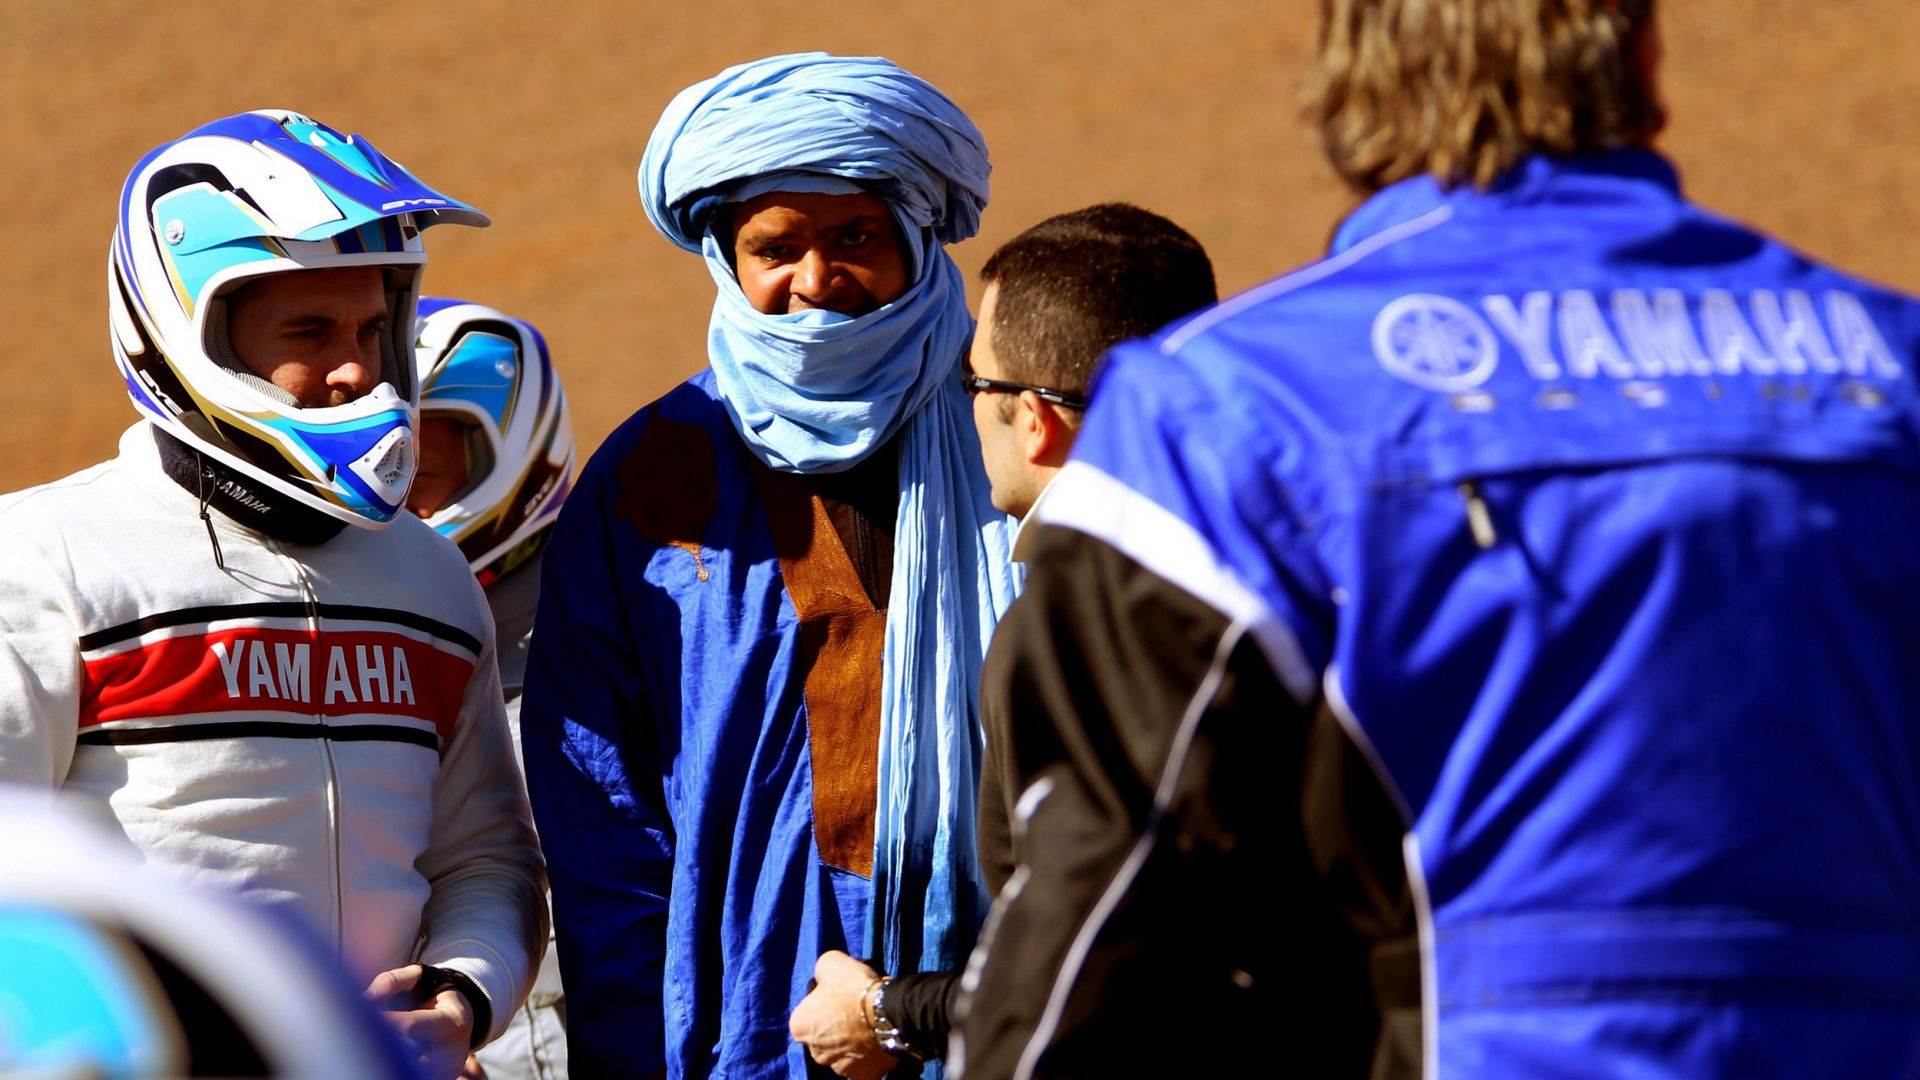 Immagine 29: In Marocco con la Yamaha Super Ténéré